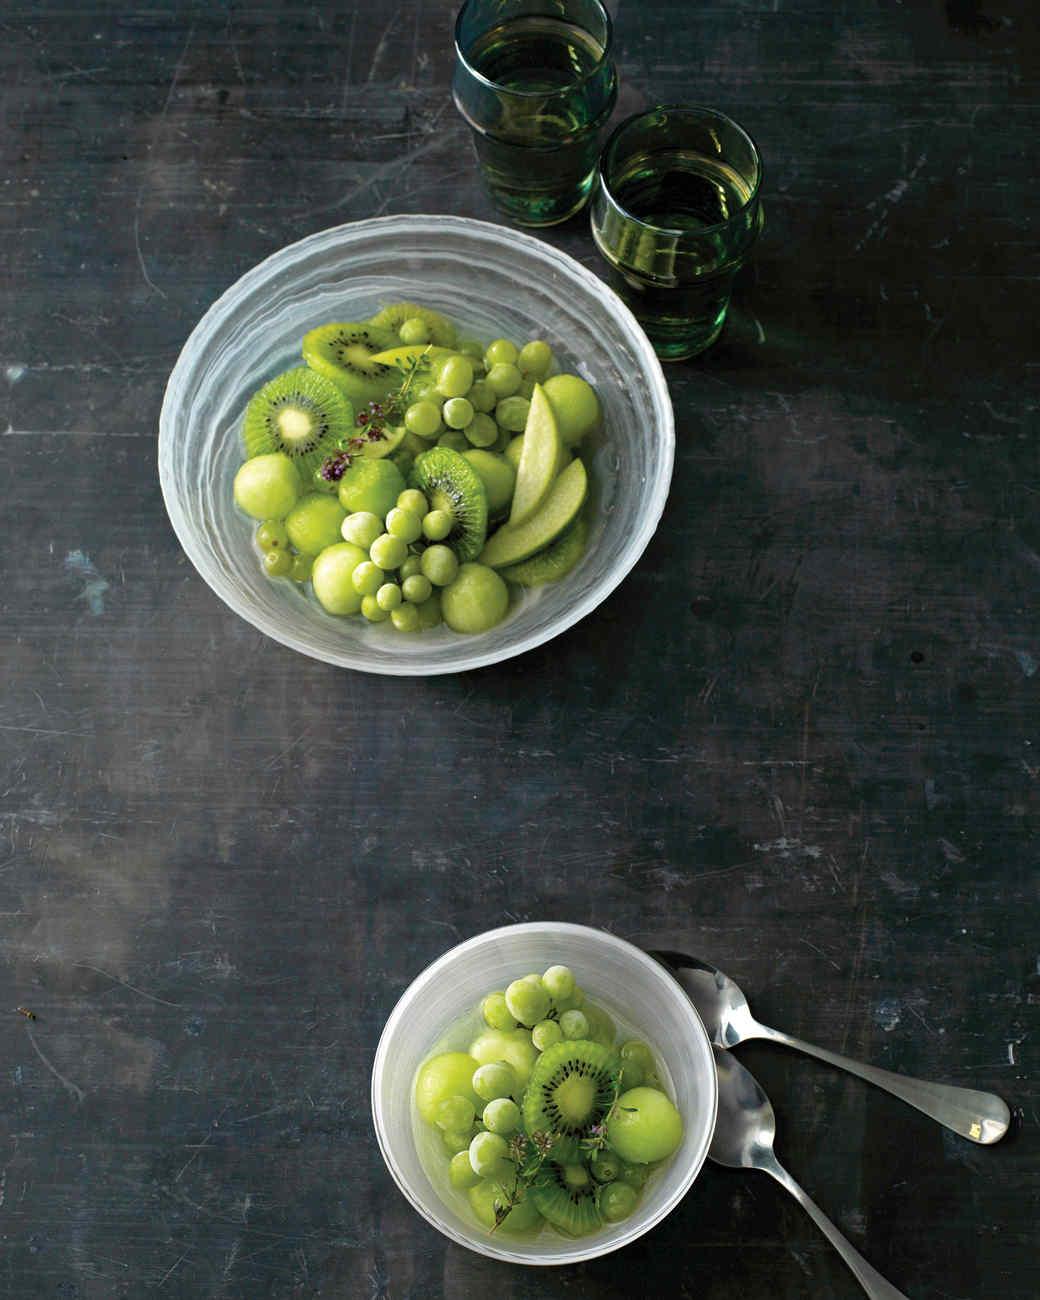 kiwi-grape-salad-0811mld104304.jpg